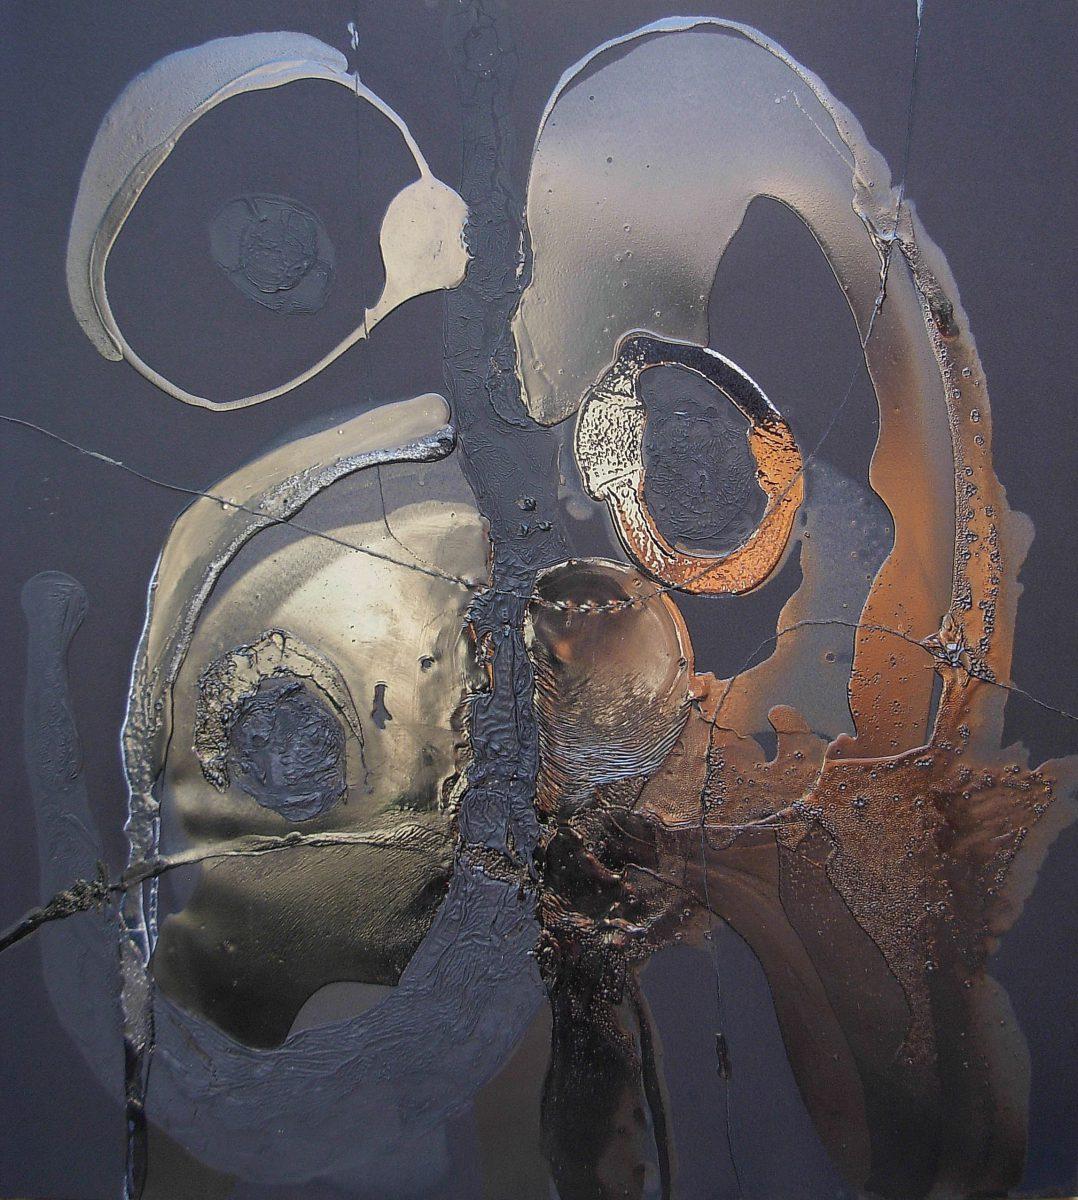 Julio César Soria Justo, Marea Negra, tecnica mista su lineo plastificato, 110x100cm, s.d.